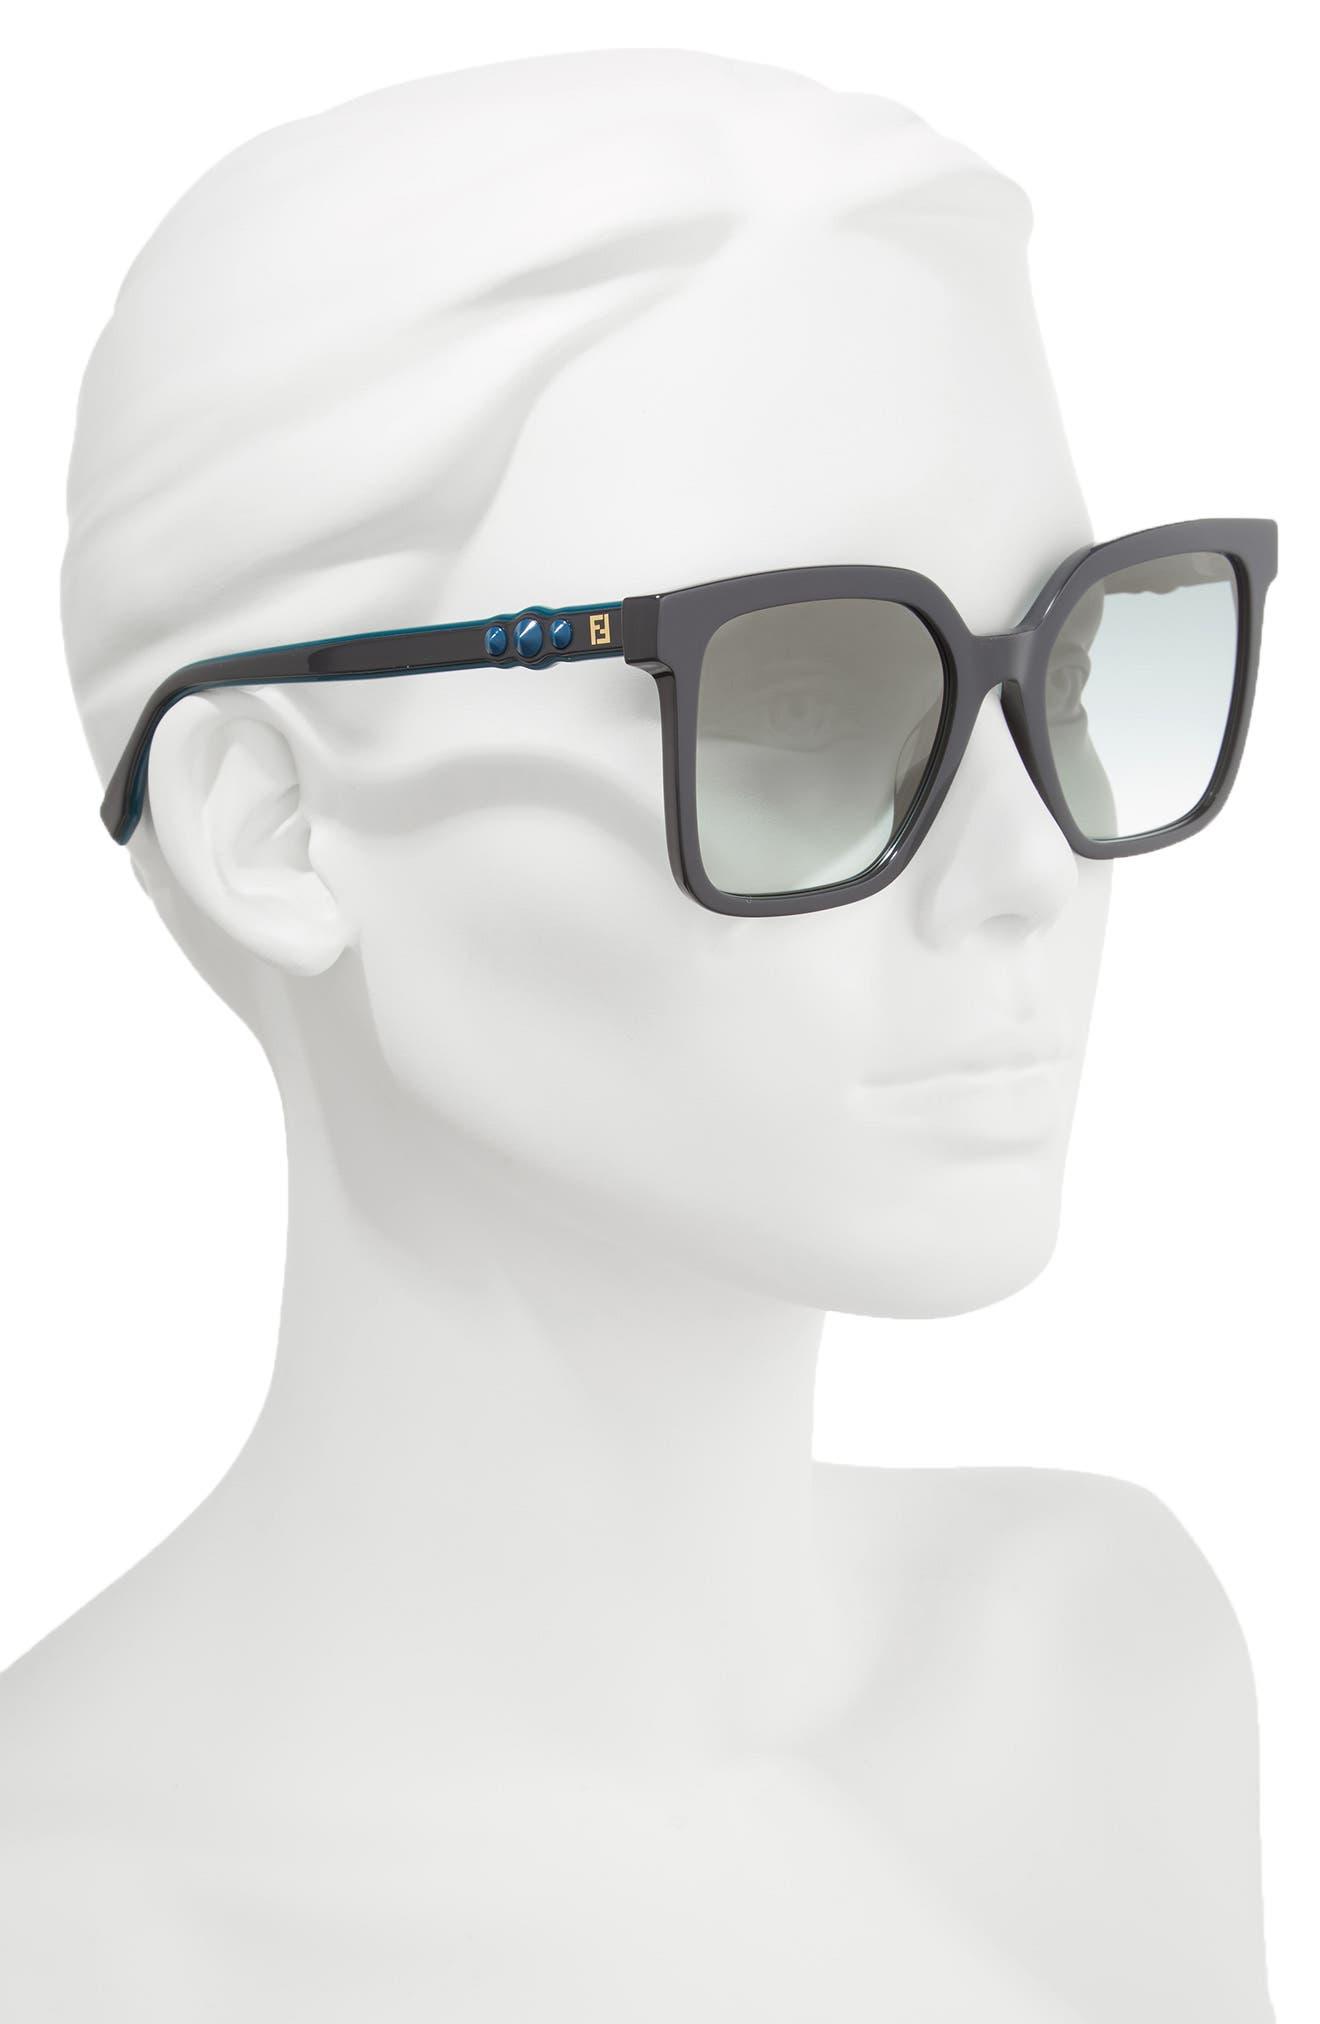 54mm Square Sunglasses,                             Alternate thumbnail 2, color,                             GREY